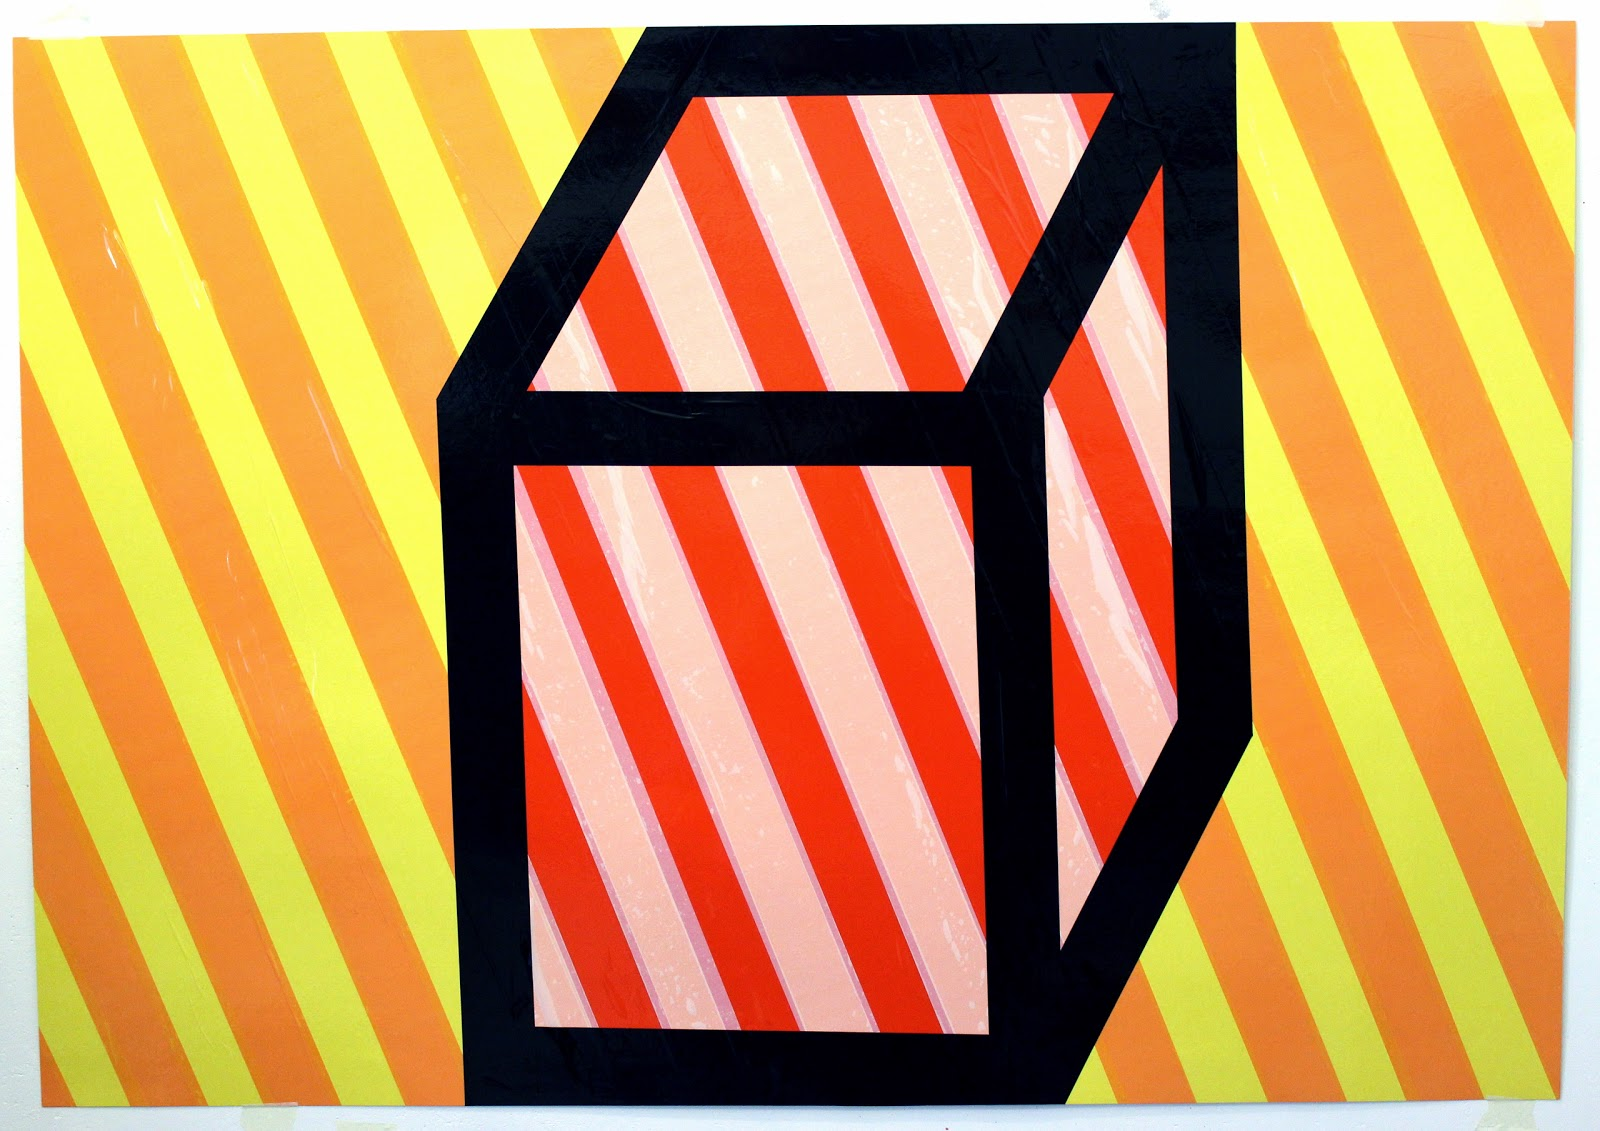 Cube. tape art artist nikolay vasilyev